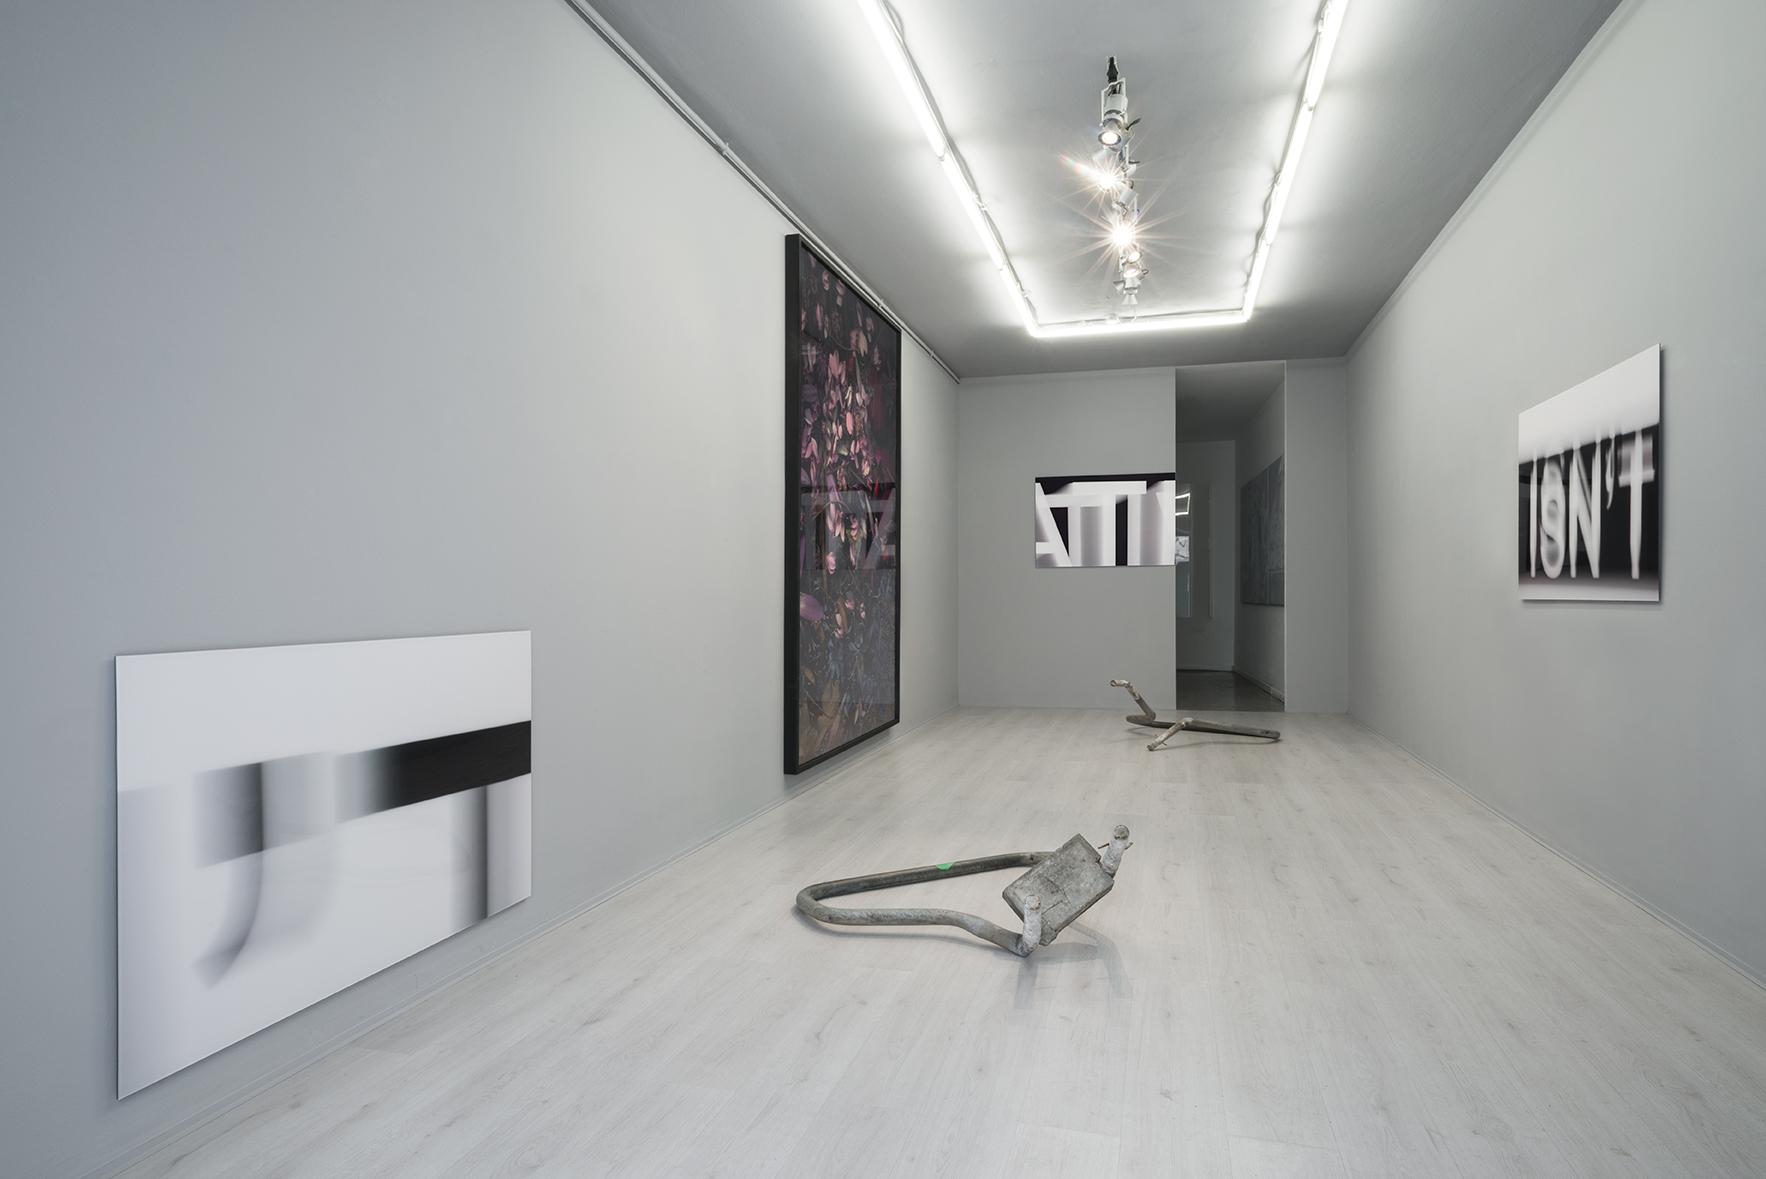 Slash, exhibition view, Simon Laureyns, Silvia Hell, Niccolò Morgan Gandolfi